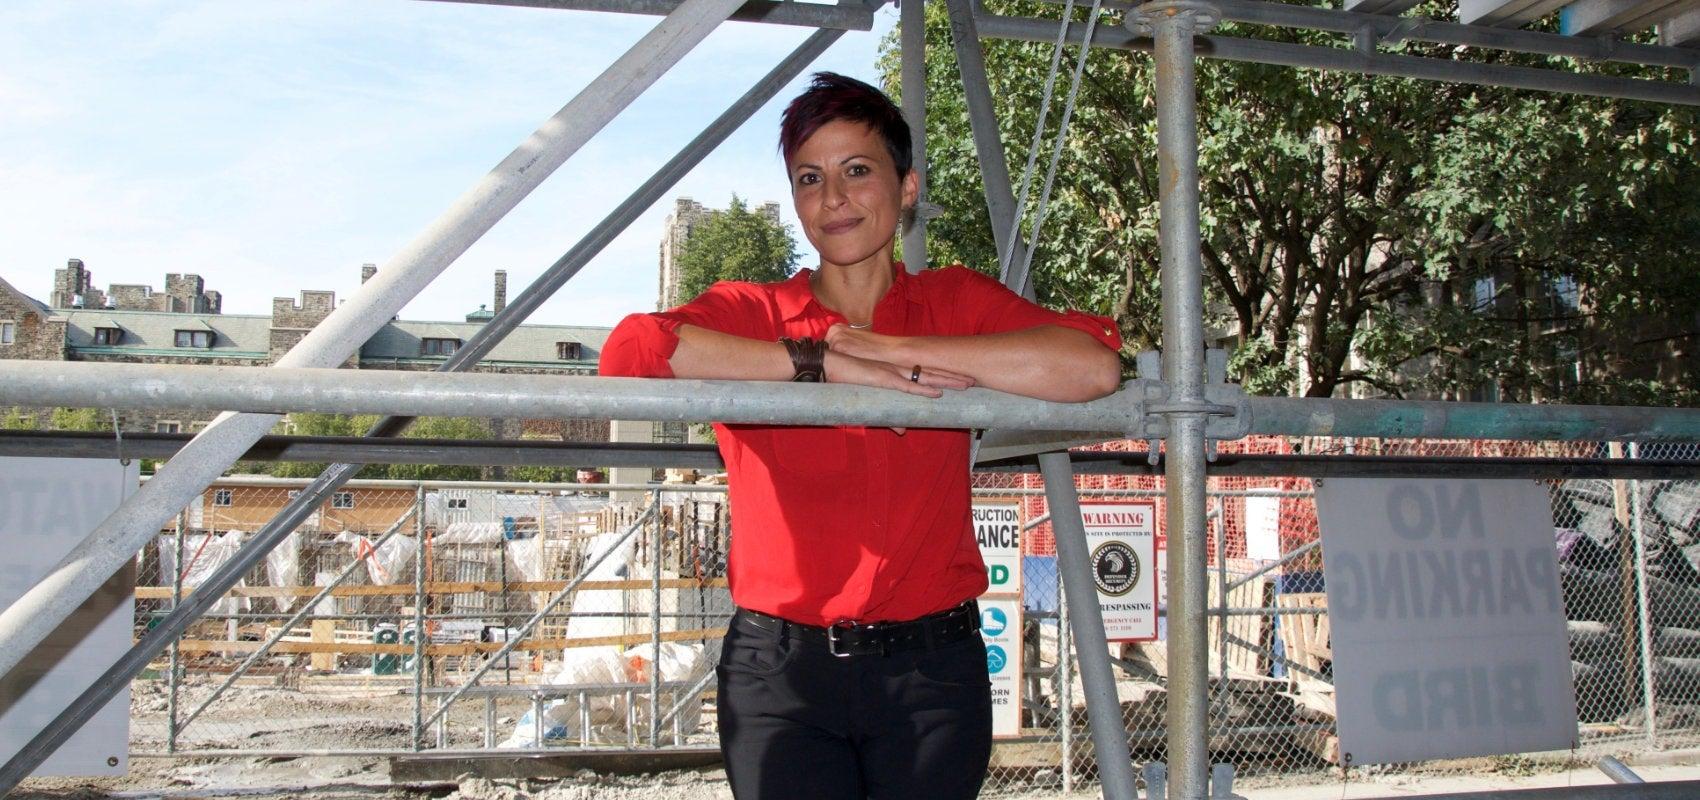 U of T's Deborah Cowen wins Trudeau Fellowship for boundary-busting research